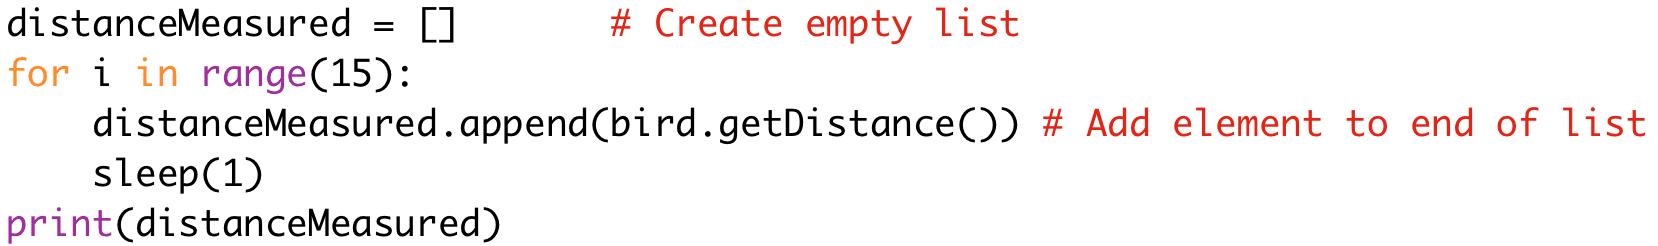 distanceMeasured = [] # Create empty list  for i in range(15):  distanceMeasured.append(bird.getDistance()) # Add element to end of list  sleep(1)  print(distanceMeasured)